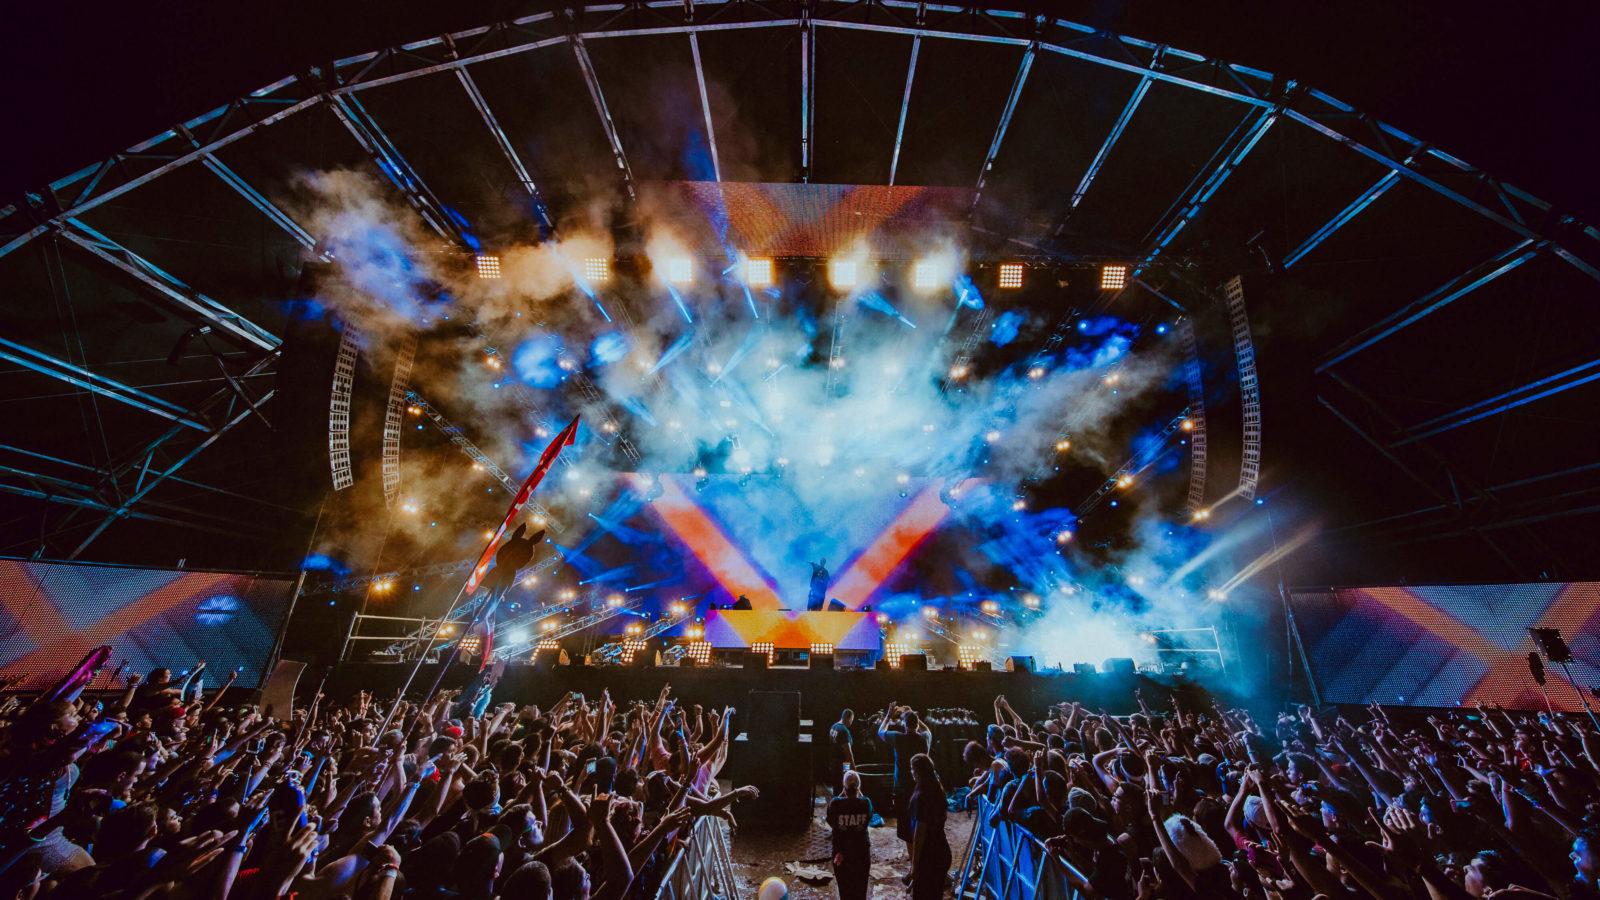 sun city main stage